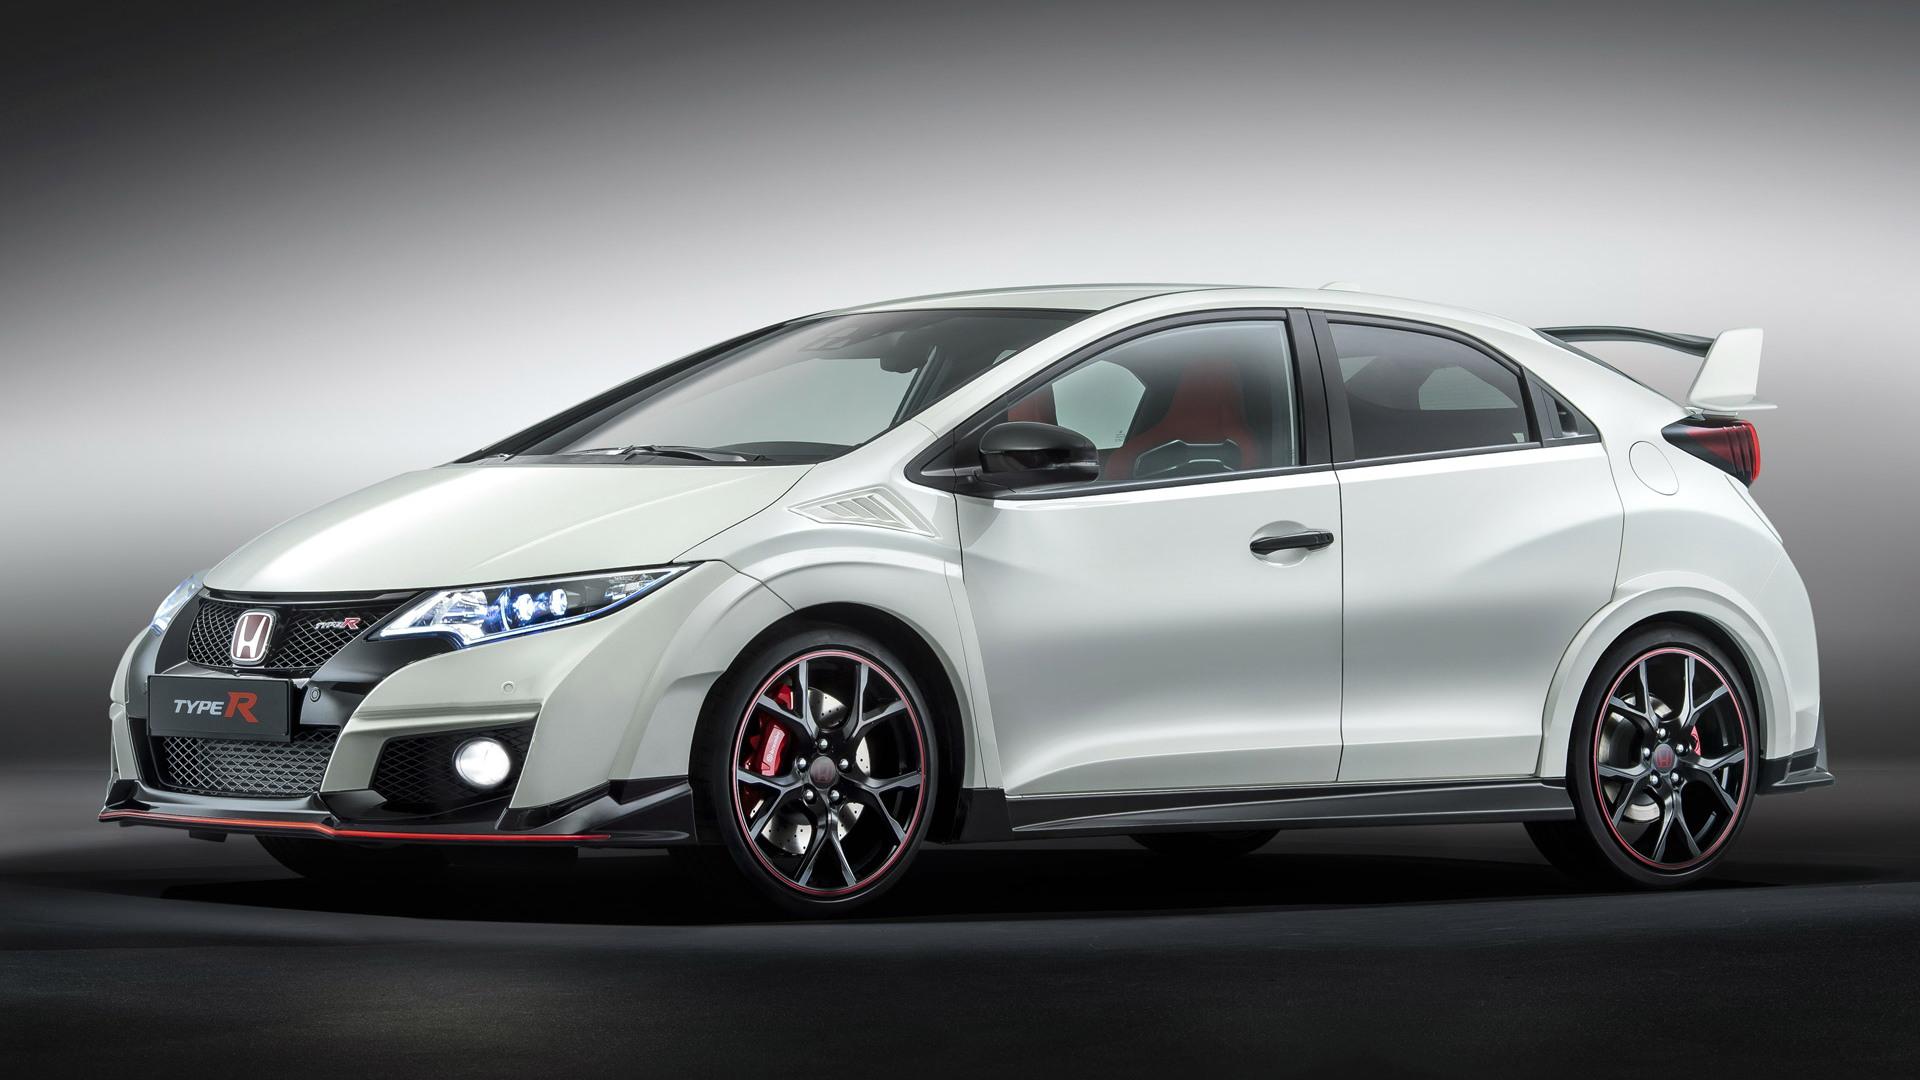 European Honda Civic Headed For North America In Mid 2016 Report